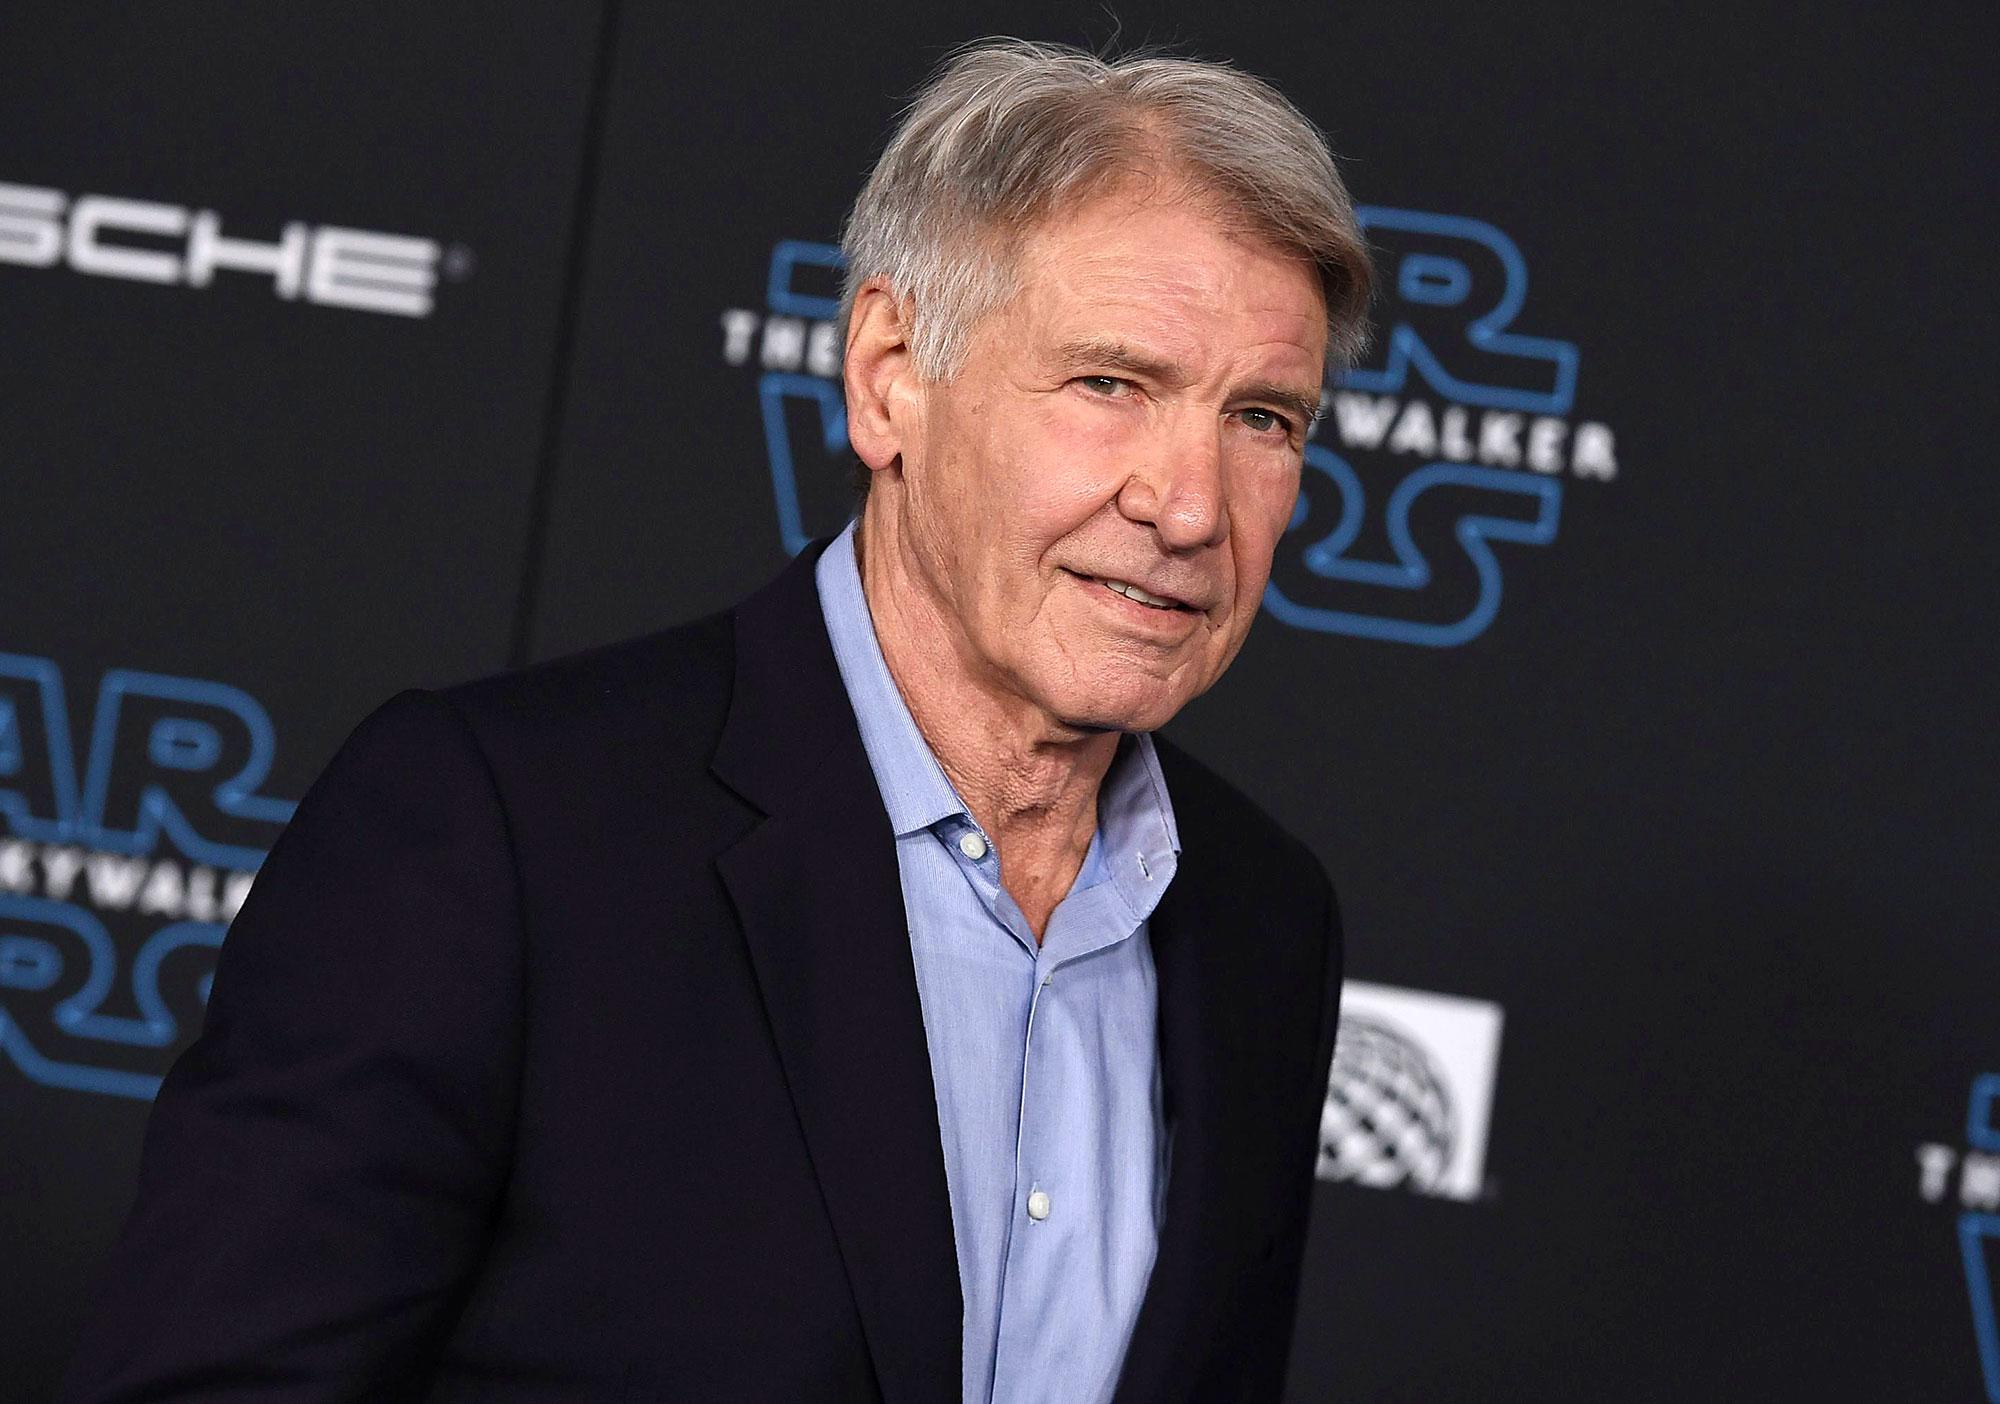 Harrison Ford Plane Runway Incident